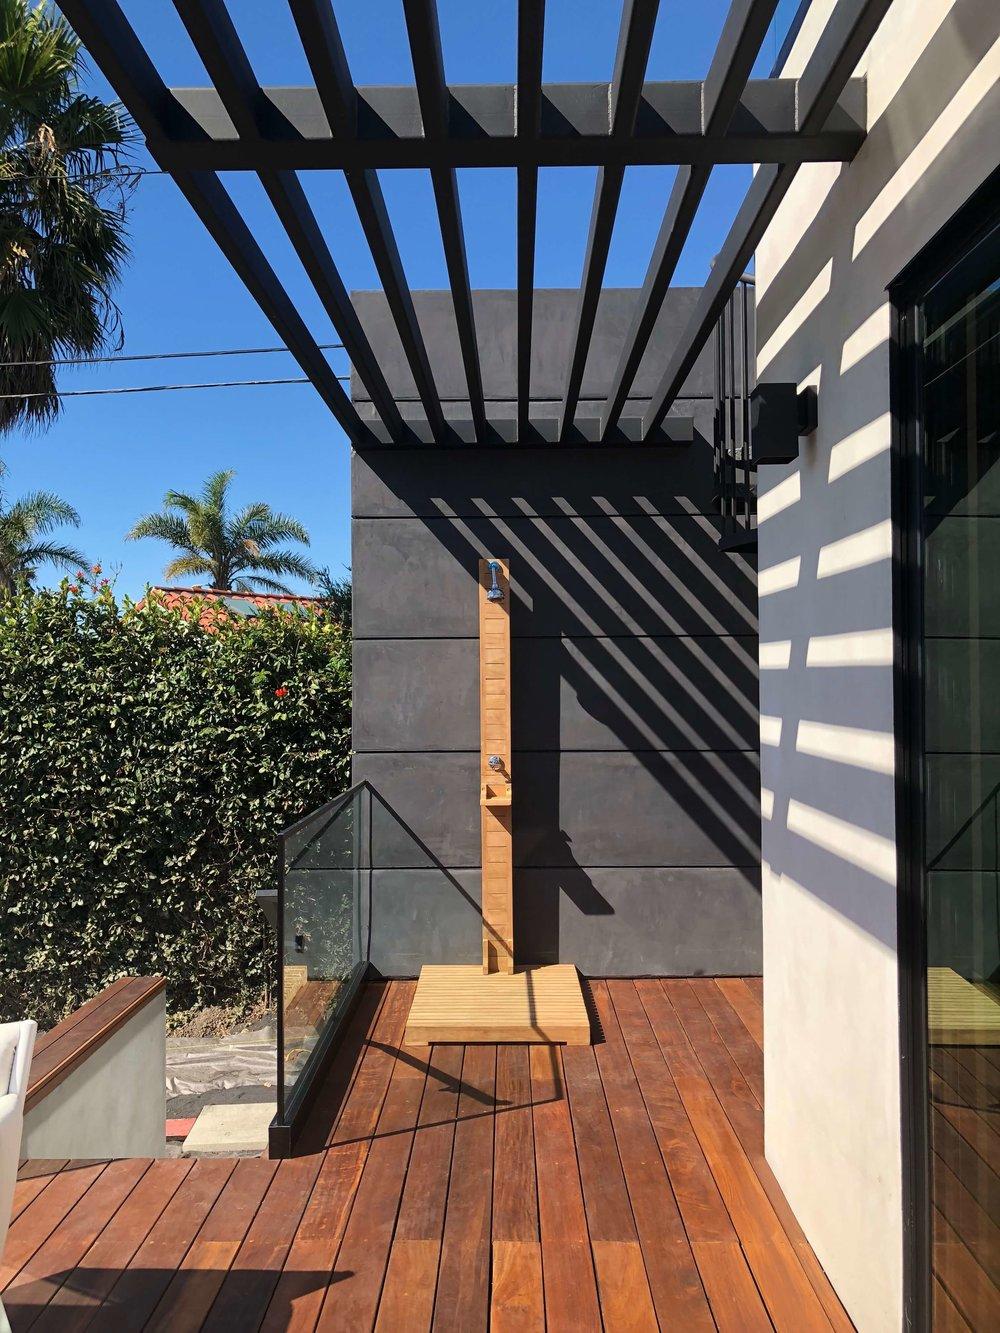 California contemporary home, Dwell on Design's Fall Home Tour, Designer: Vitus Matare #outdoorshower #pergola